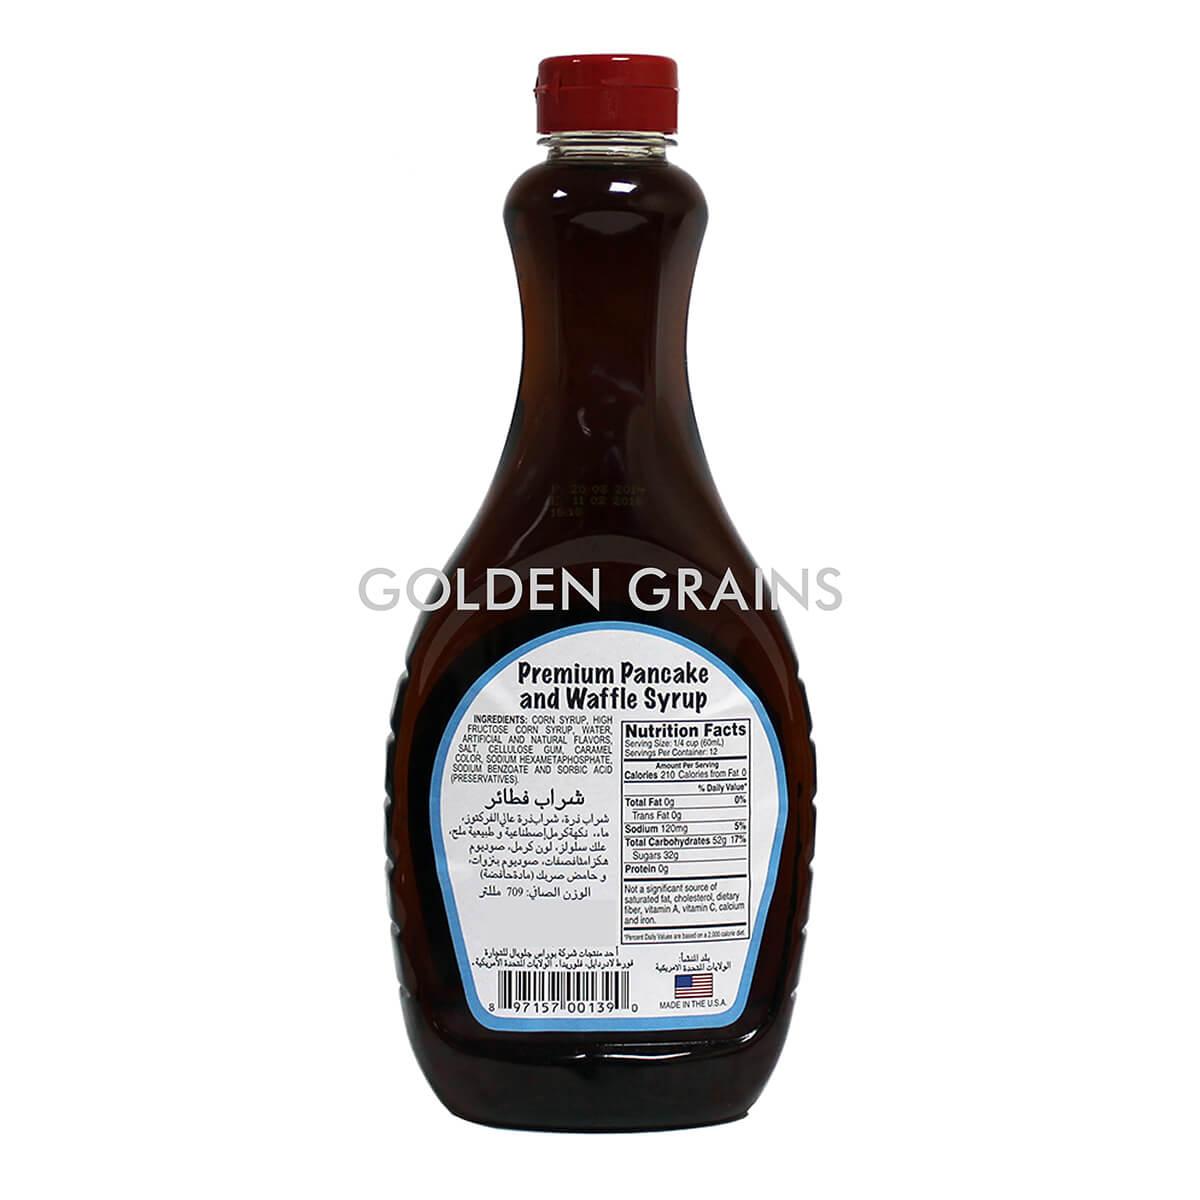 Golden Grains Dubai Export - Florida Garden - Pancake and Waffle Syrup - Back.jpg